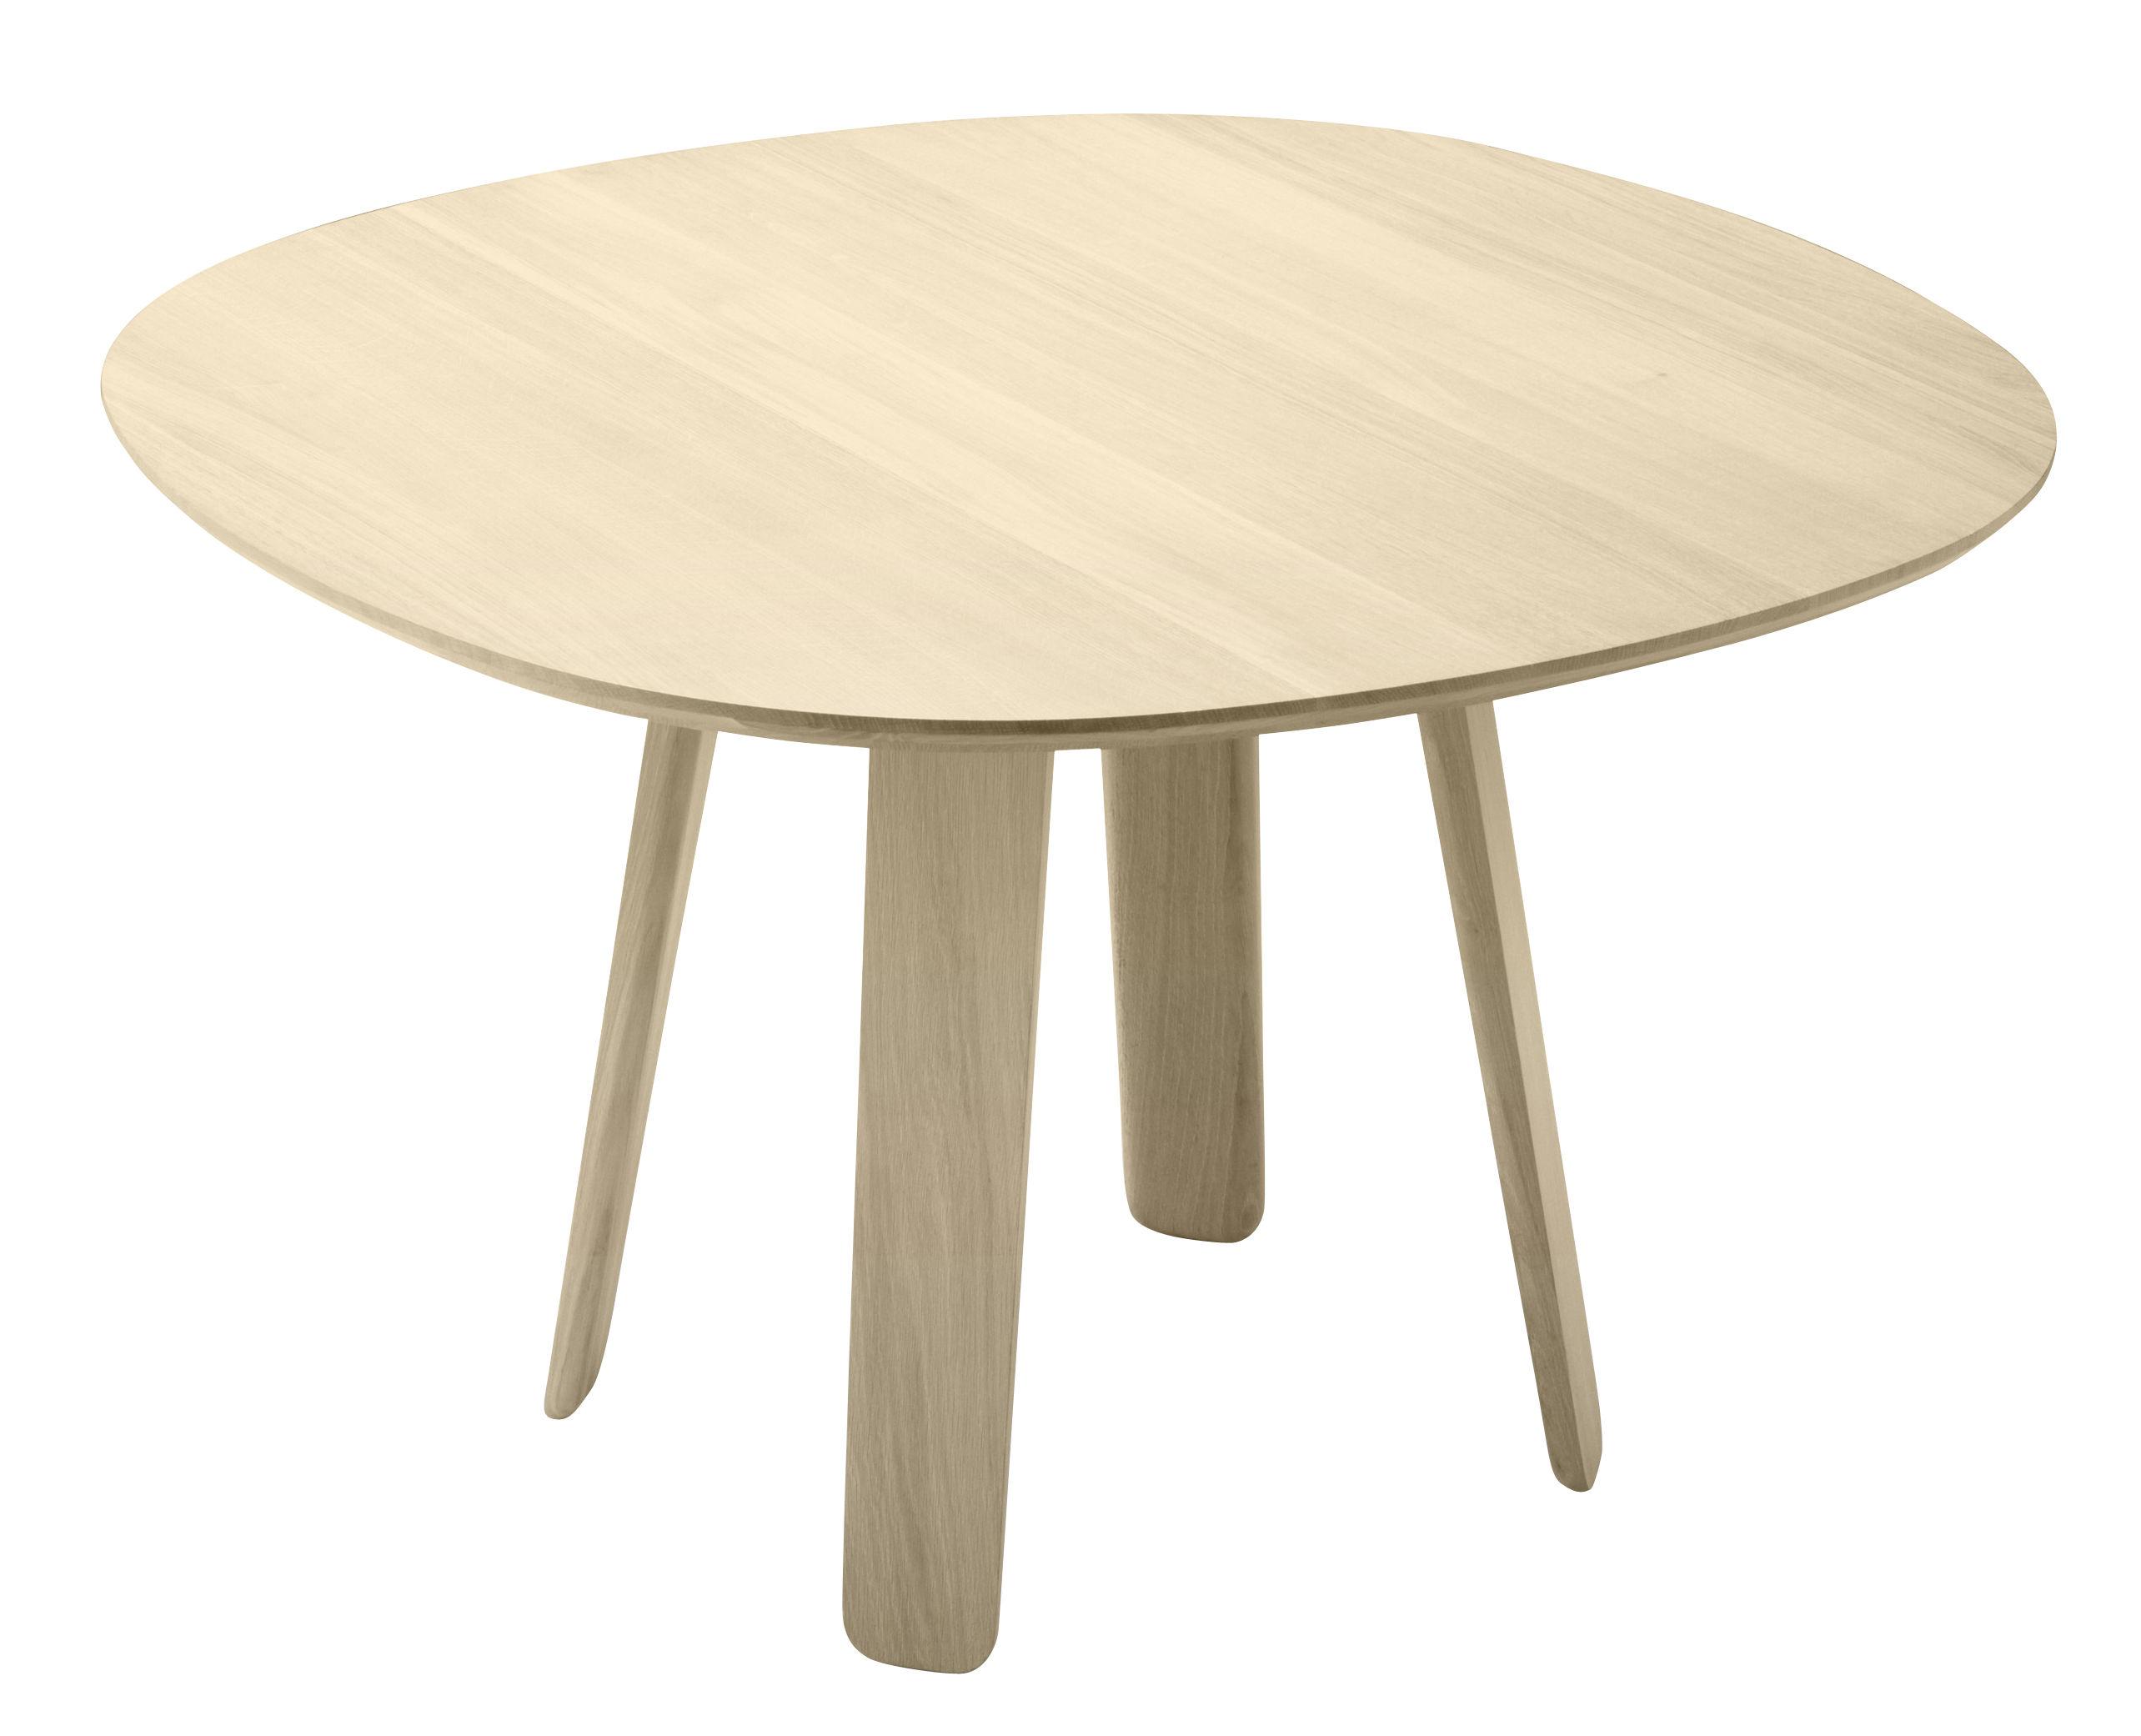 Mobilier - Tables - Table ronde Triku / Ø 100 cm - Chêne massif - Alki - Chêne naturel - Chêne massif